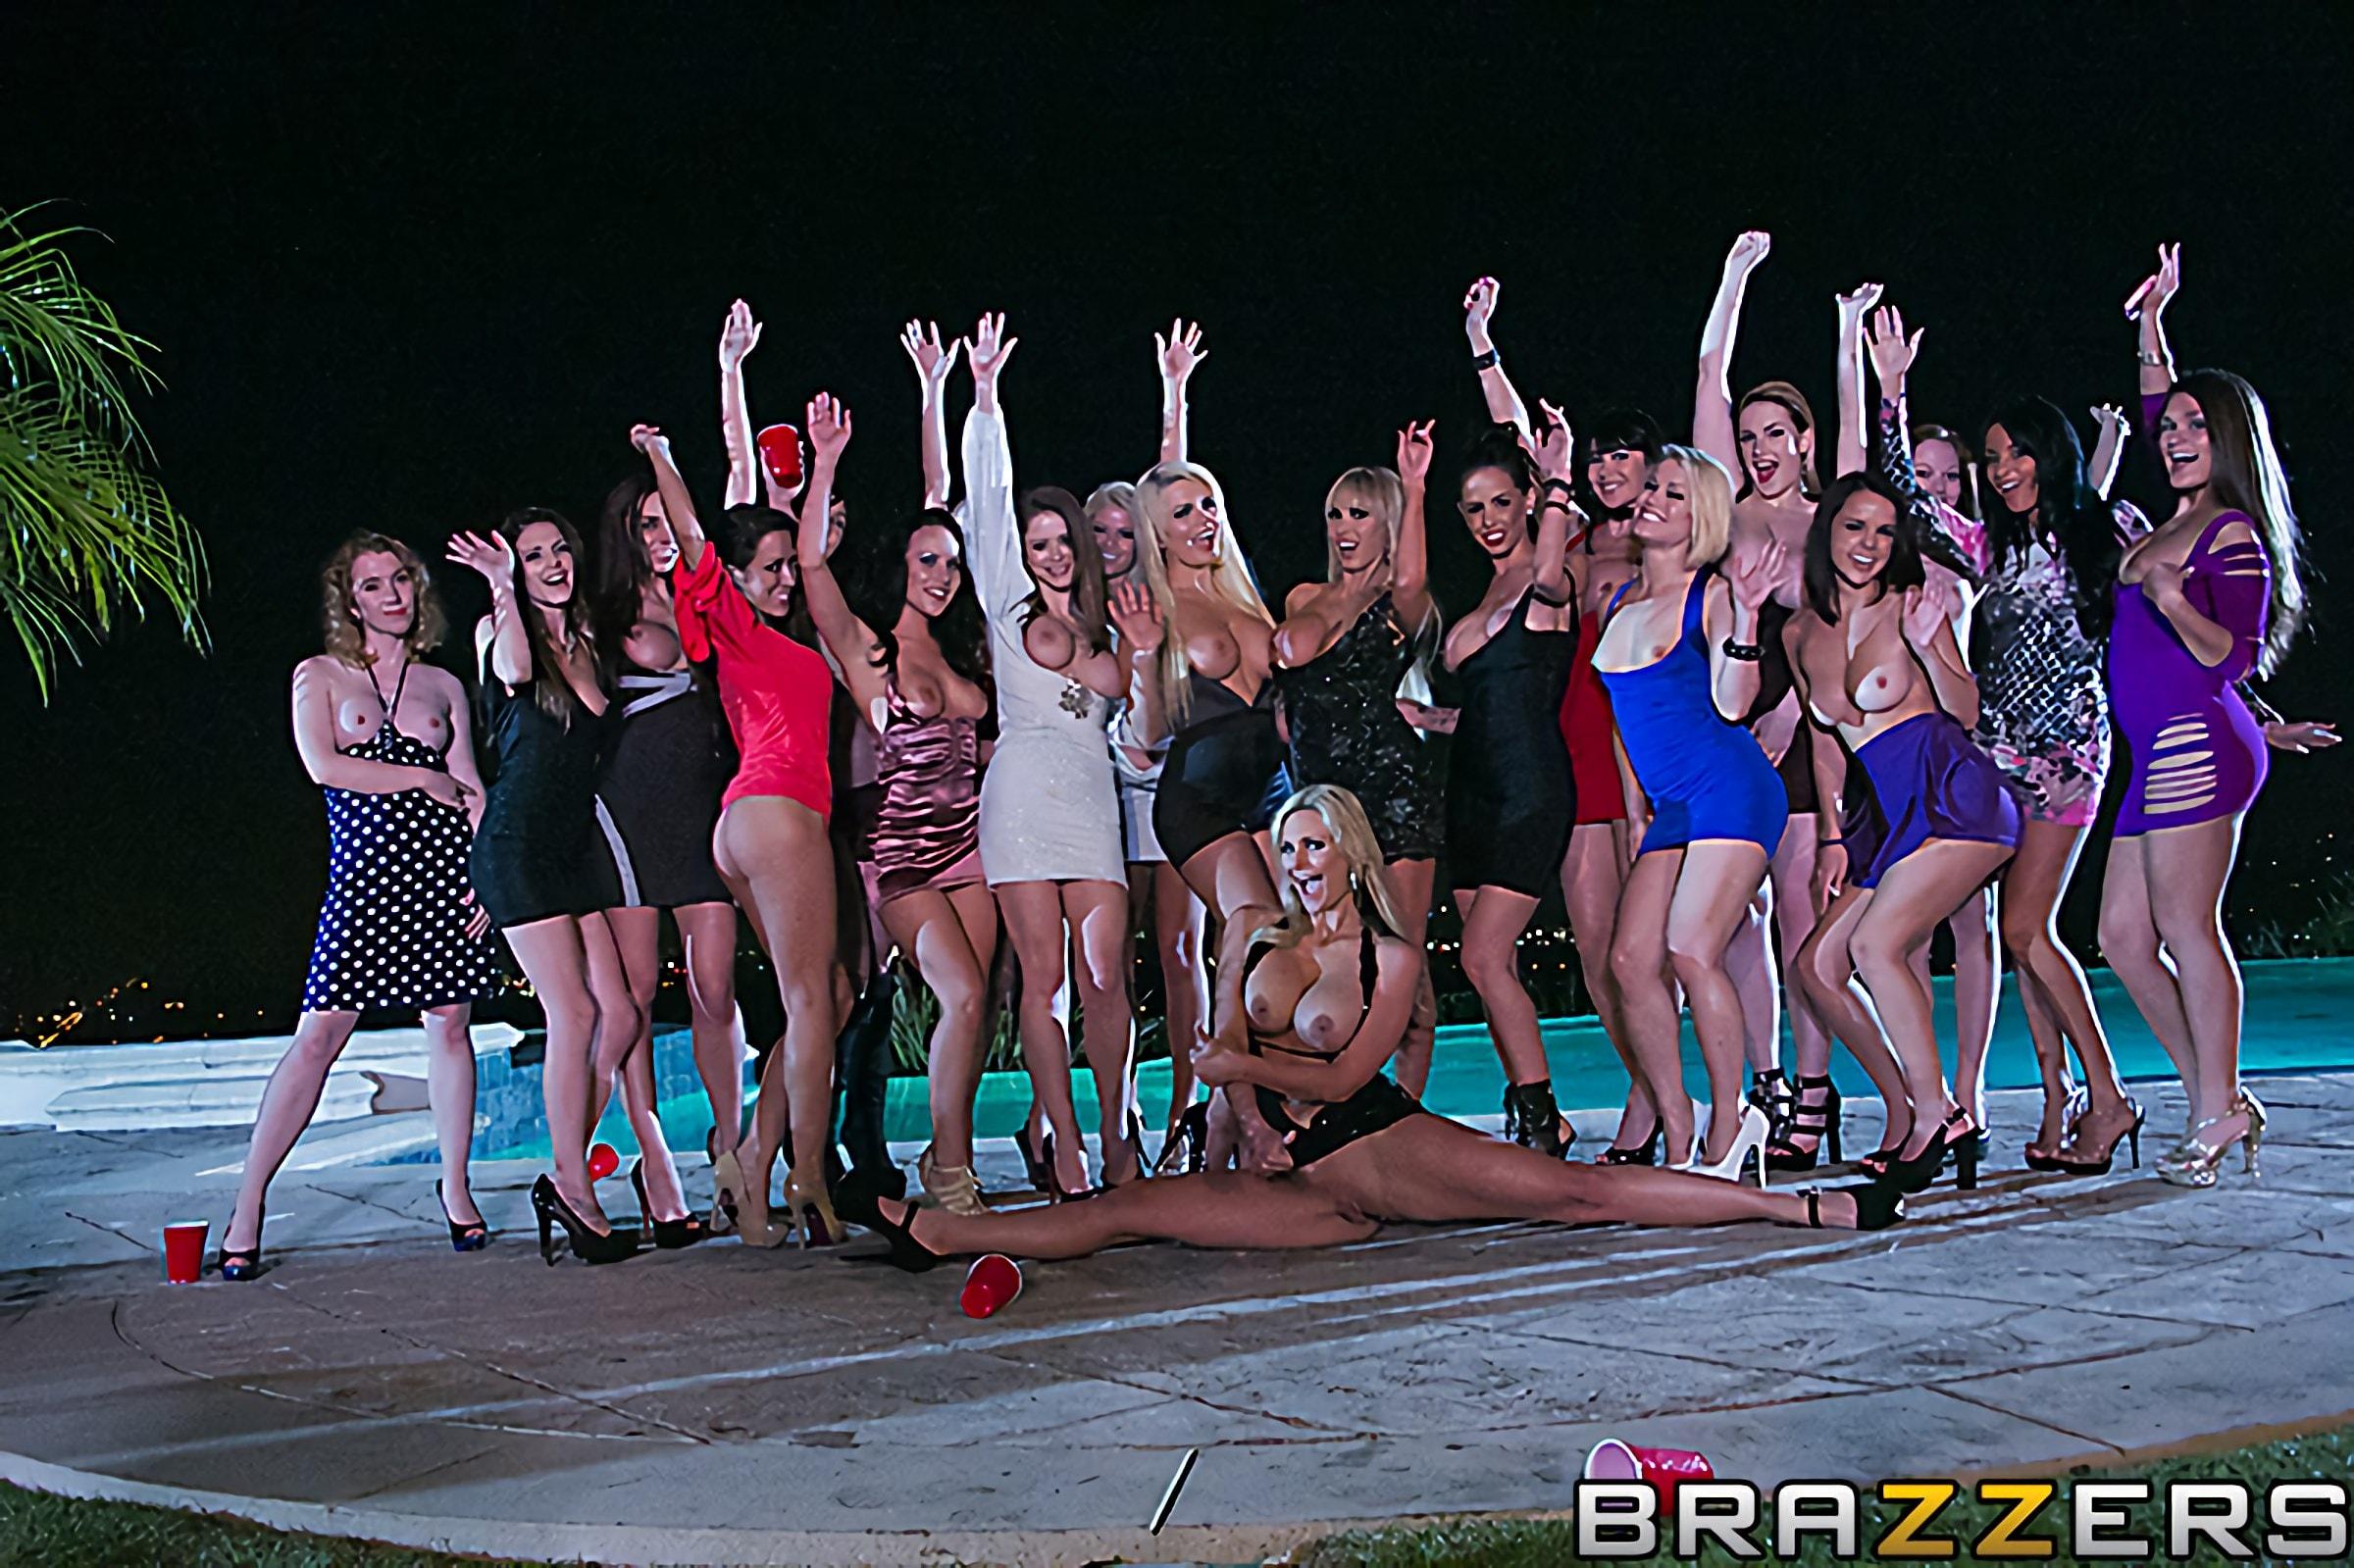 Brazzers 'A Brazzers New Years Eve' starring Nikki Benz (Photo 1)